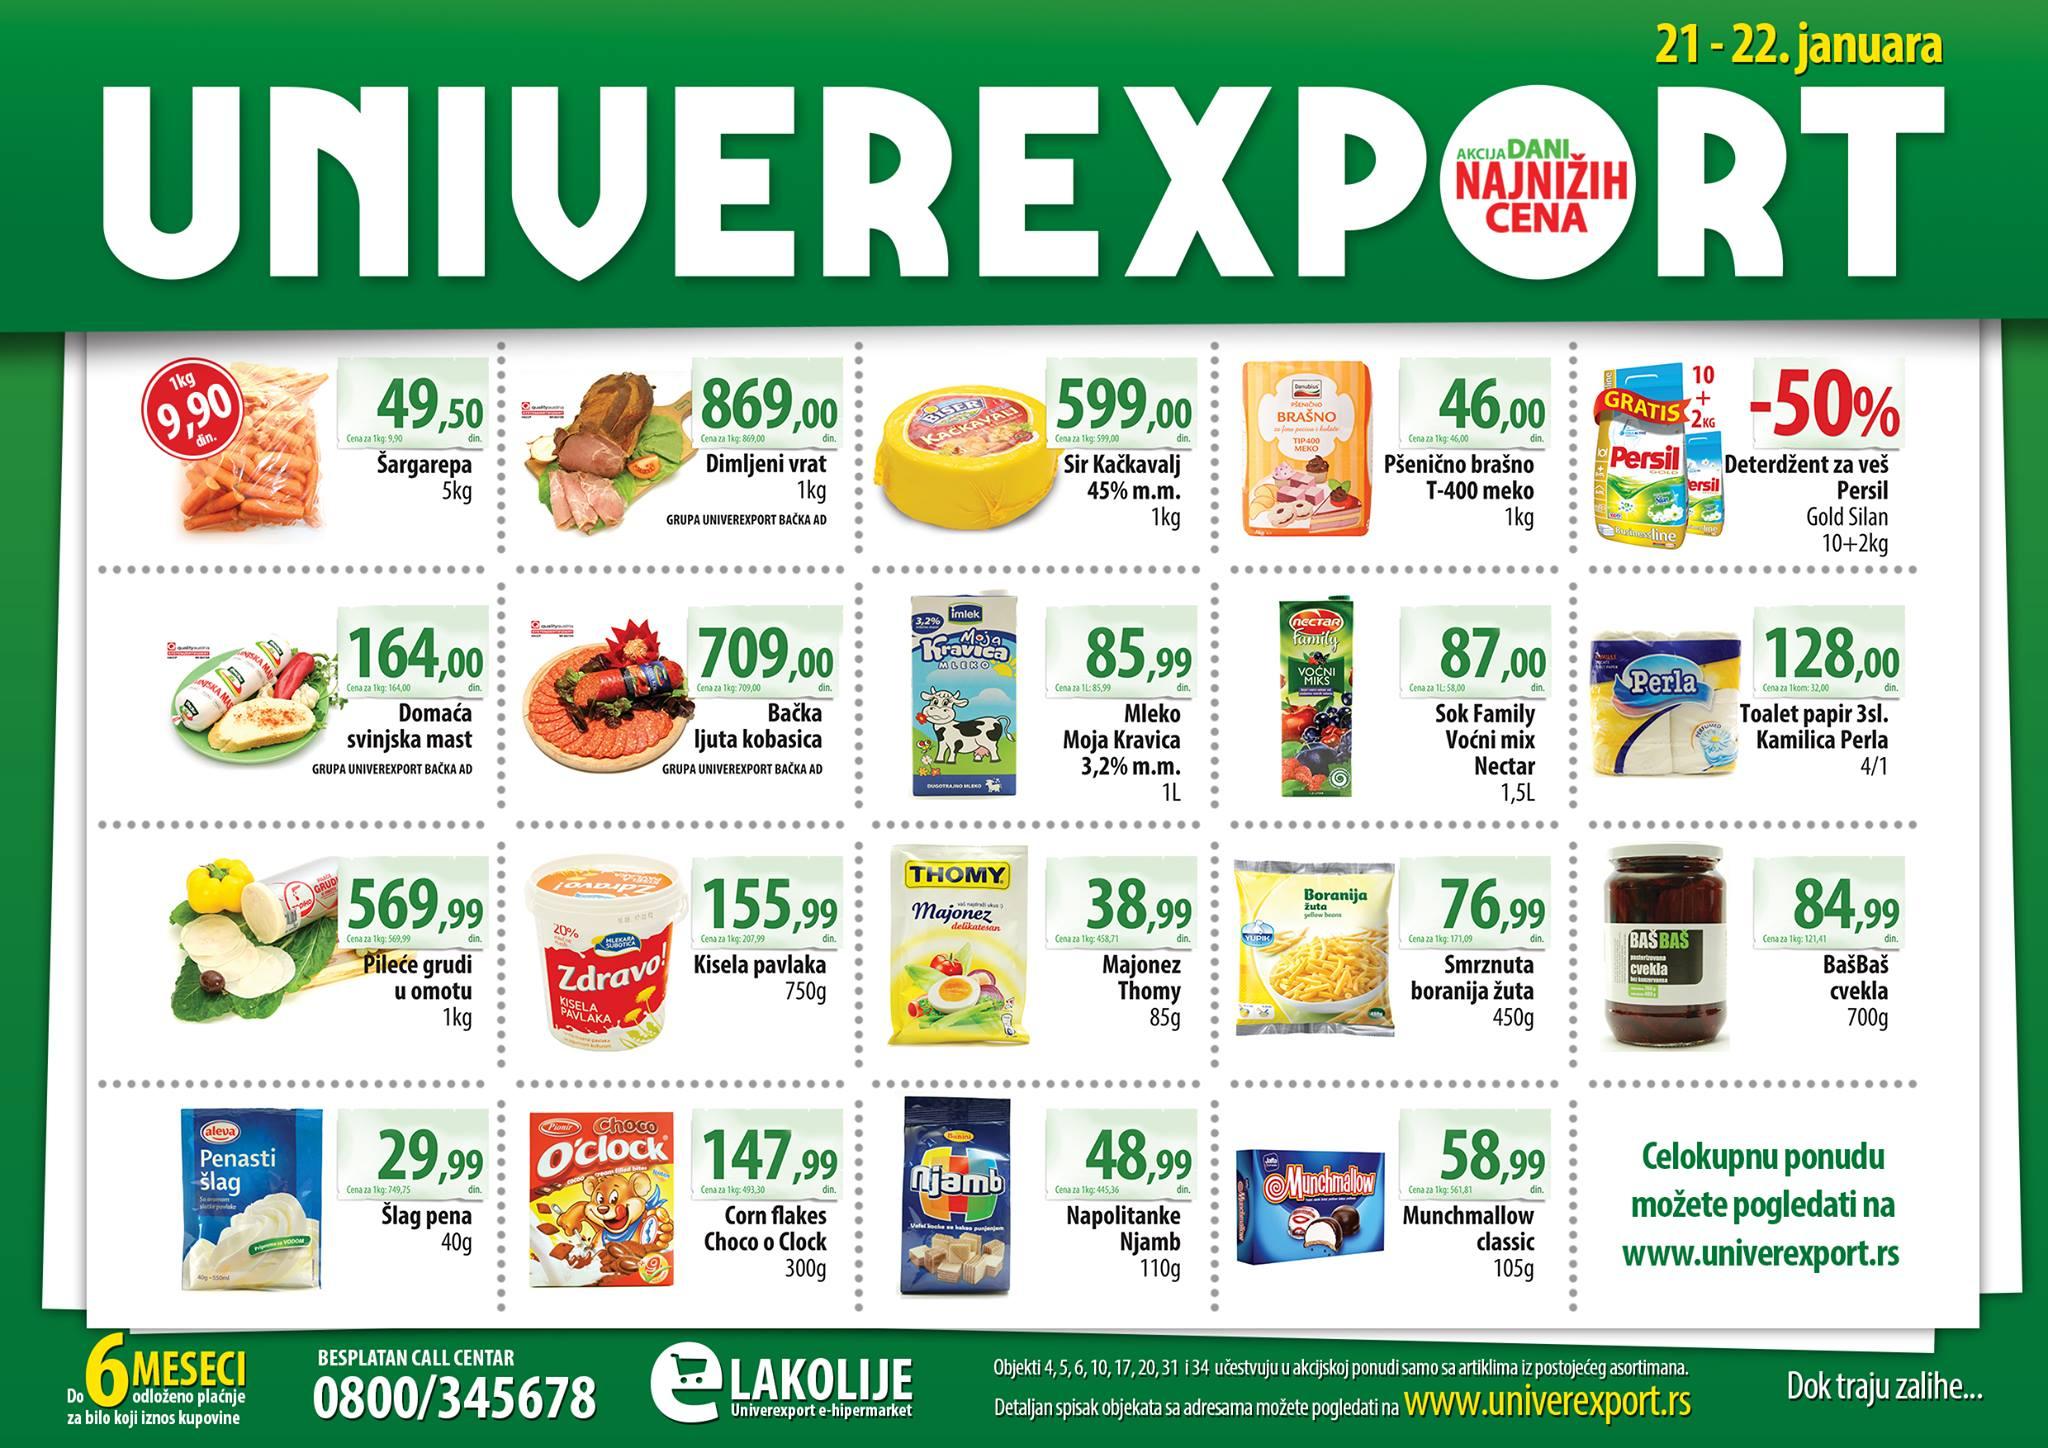 Univerexport katalog najnižih cena za vas